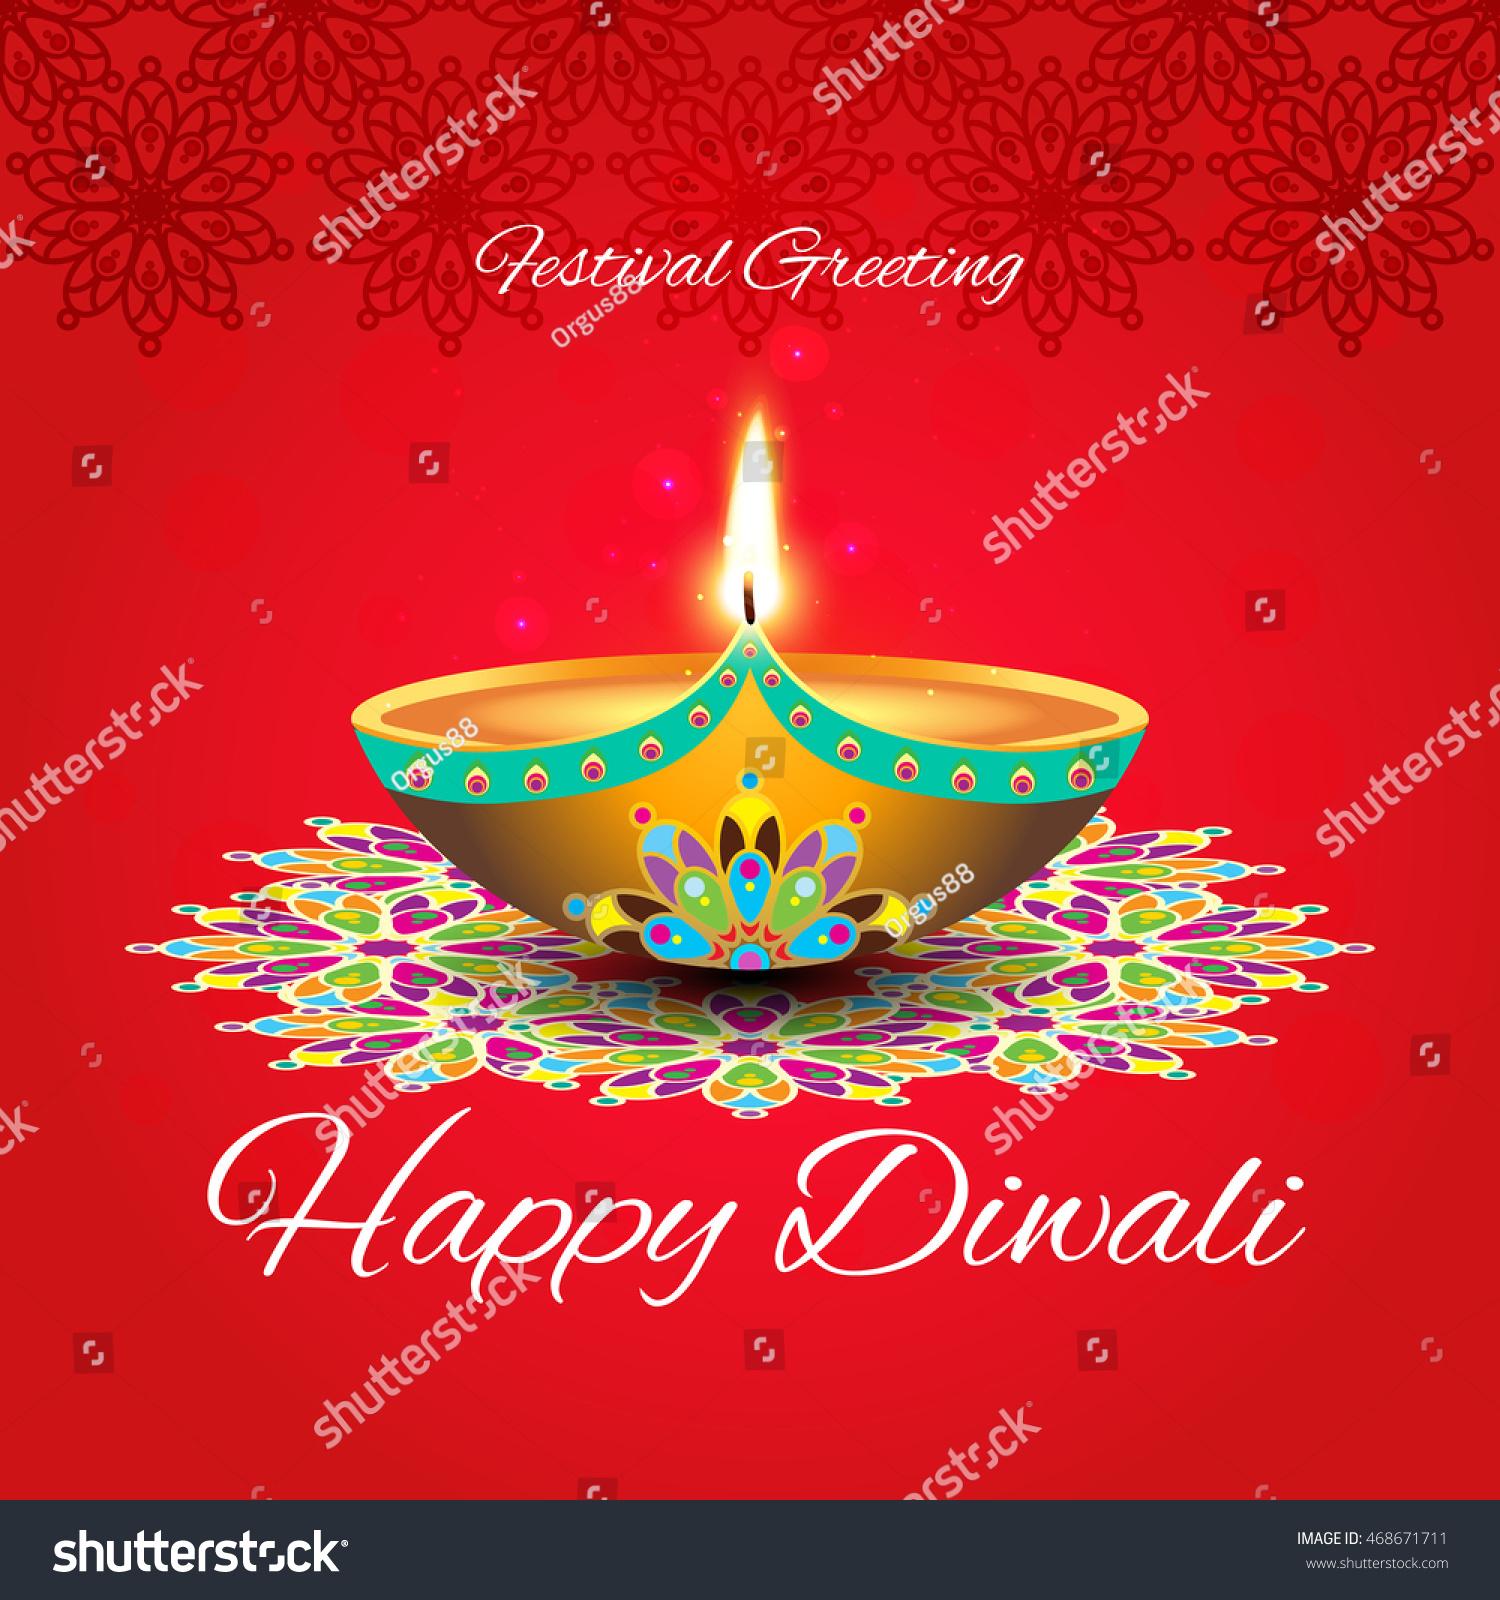 Beautiful greeting card for hindu community festival diwali happy beautiful greeting card for hindu community festival diwali happy diwali festival background illustration diwali graphic design for diwali festival m4hsunfo